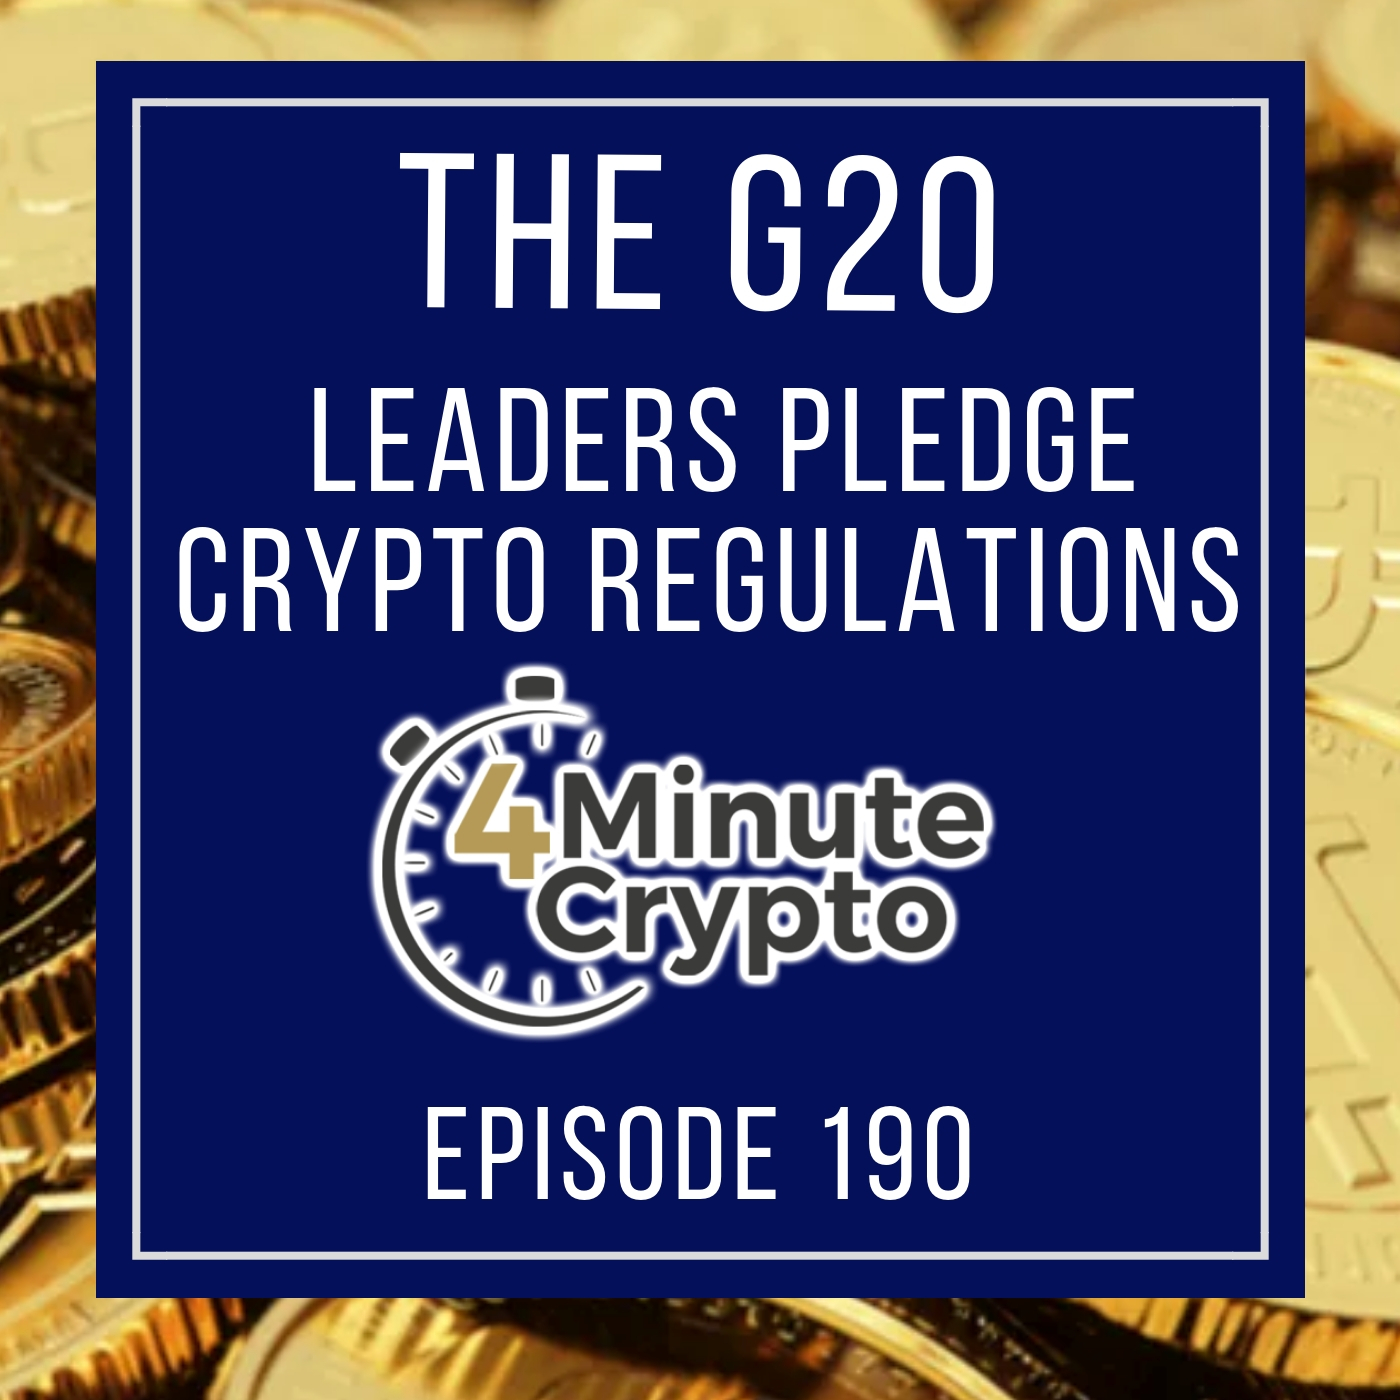 G20 Leaders Pledge Crypto Regulations